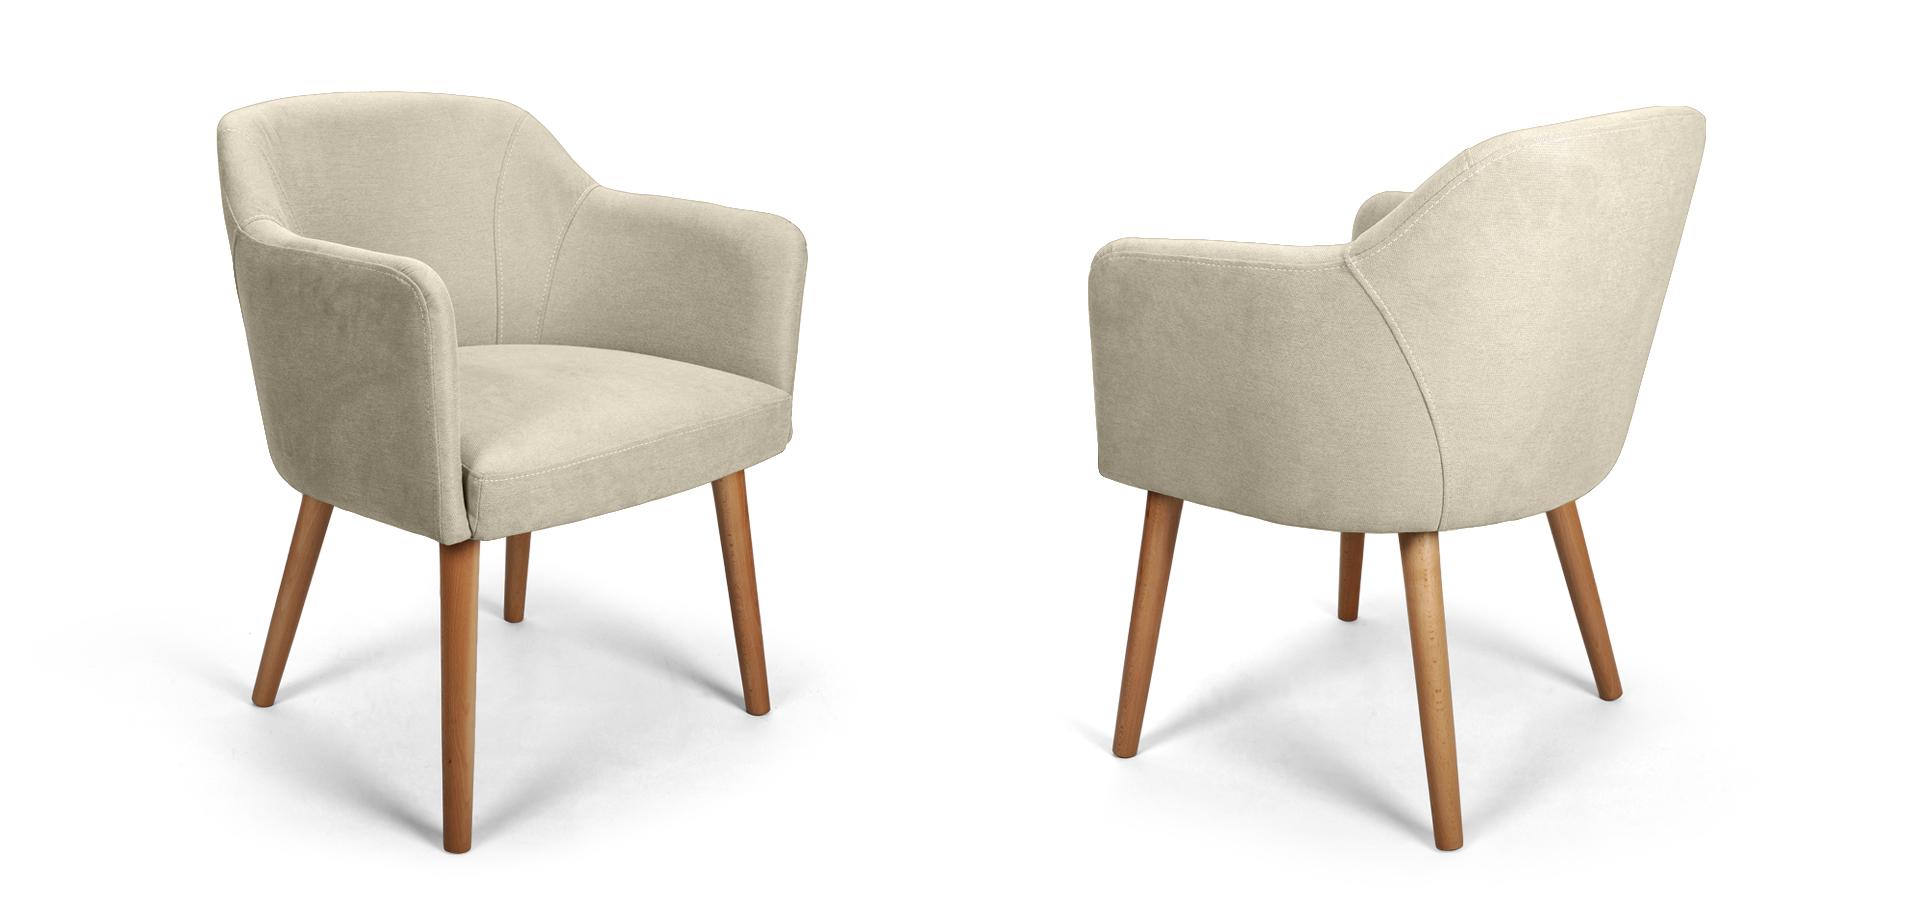 sofia-scaun-07.jpg